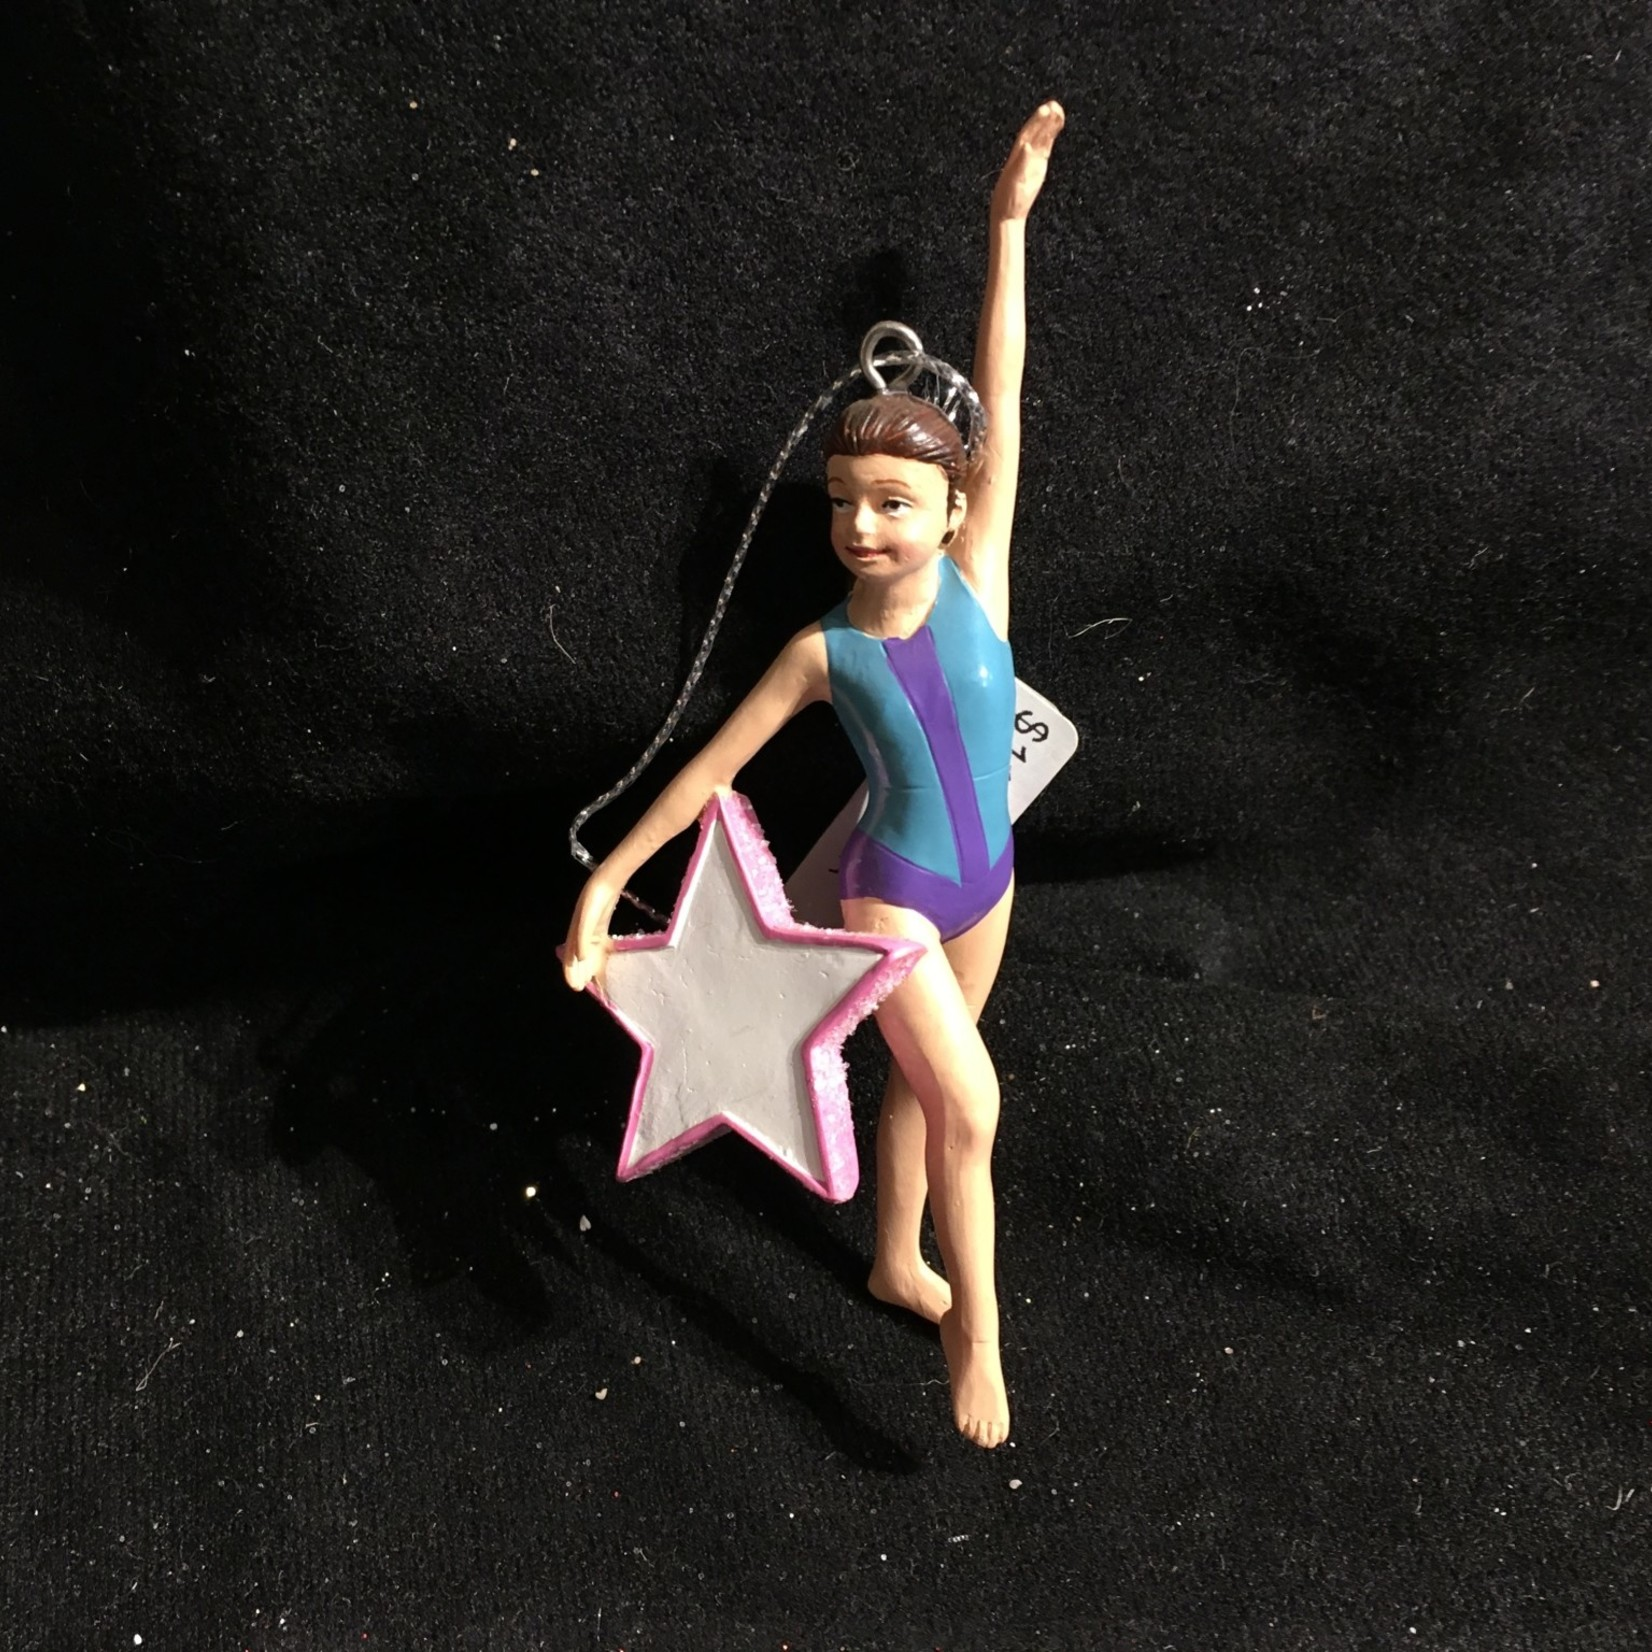 **Gymnast Star Ornament 2A